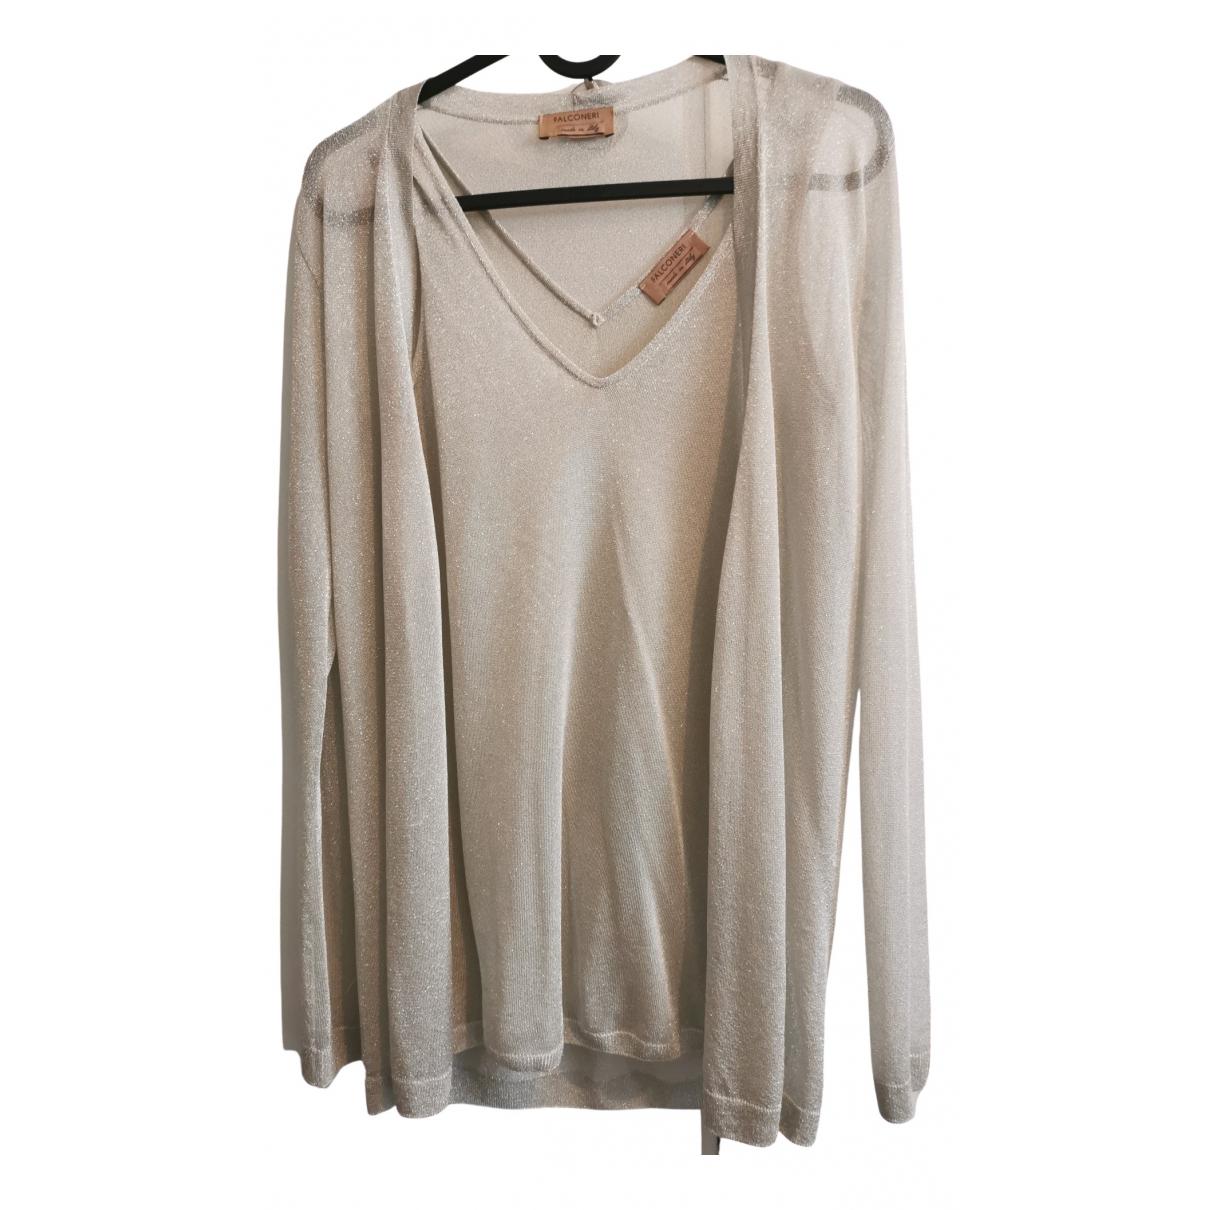 Falconeri \N Pullover in  Beige Seide